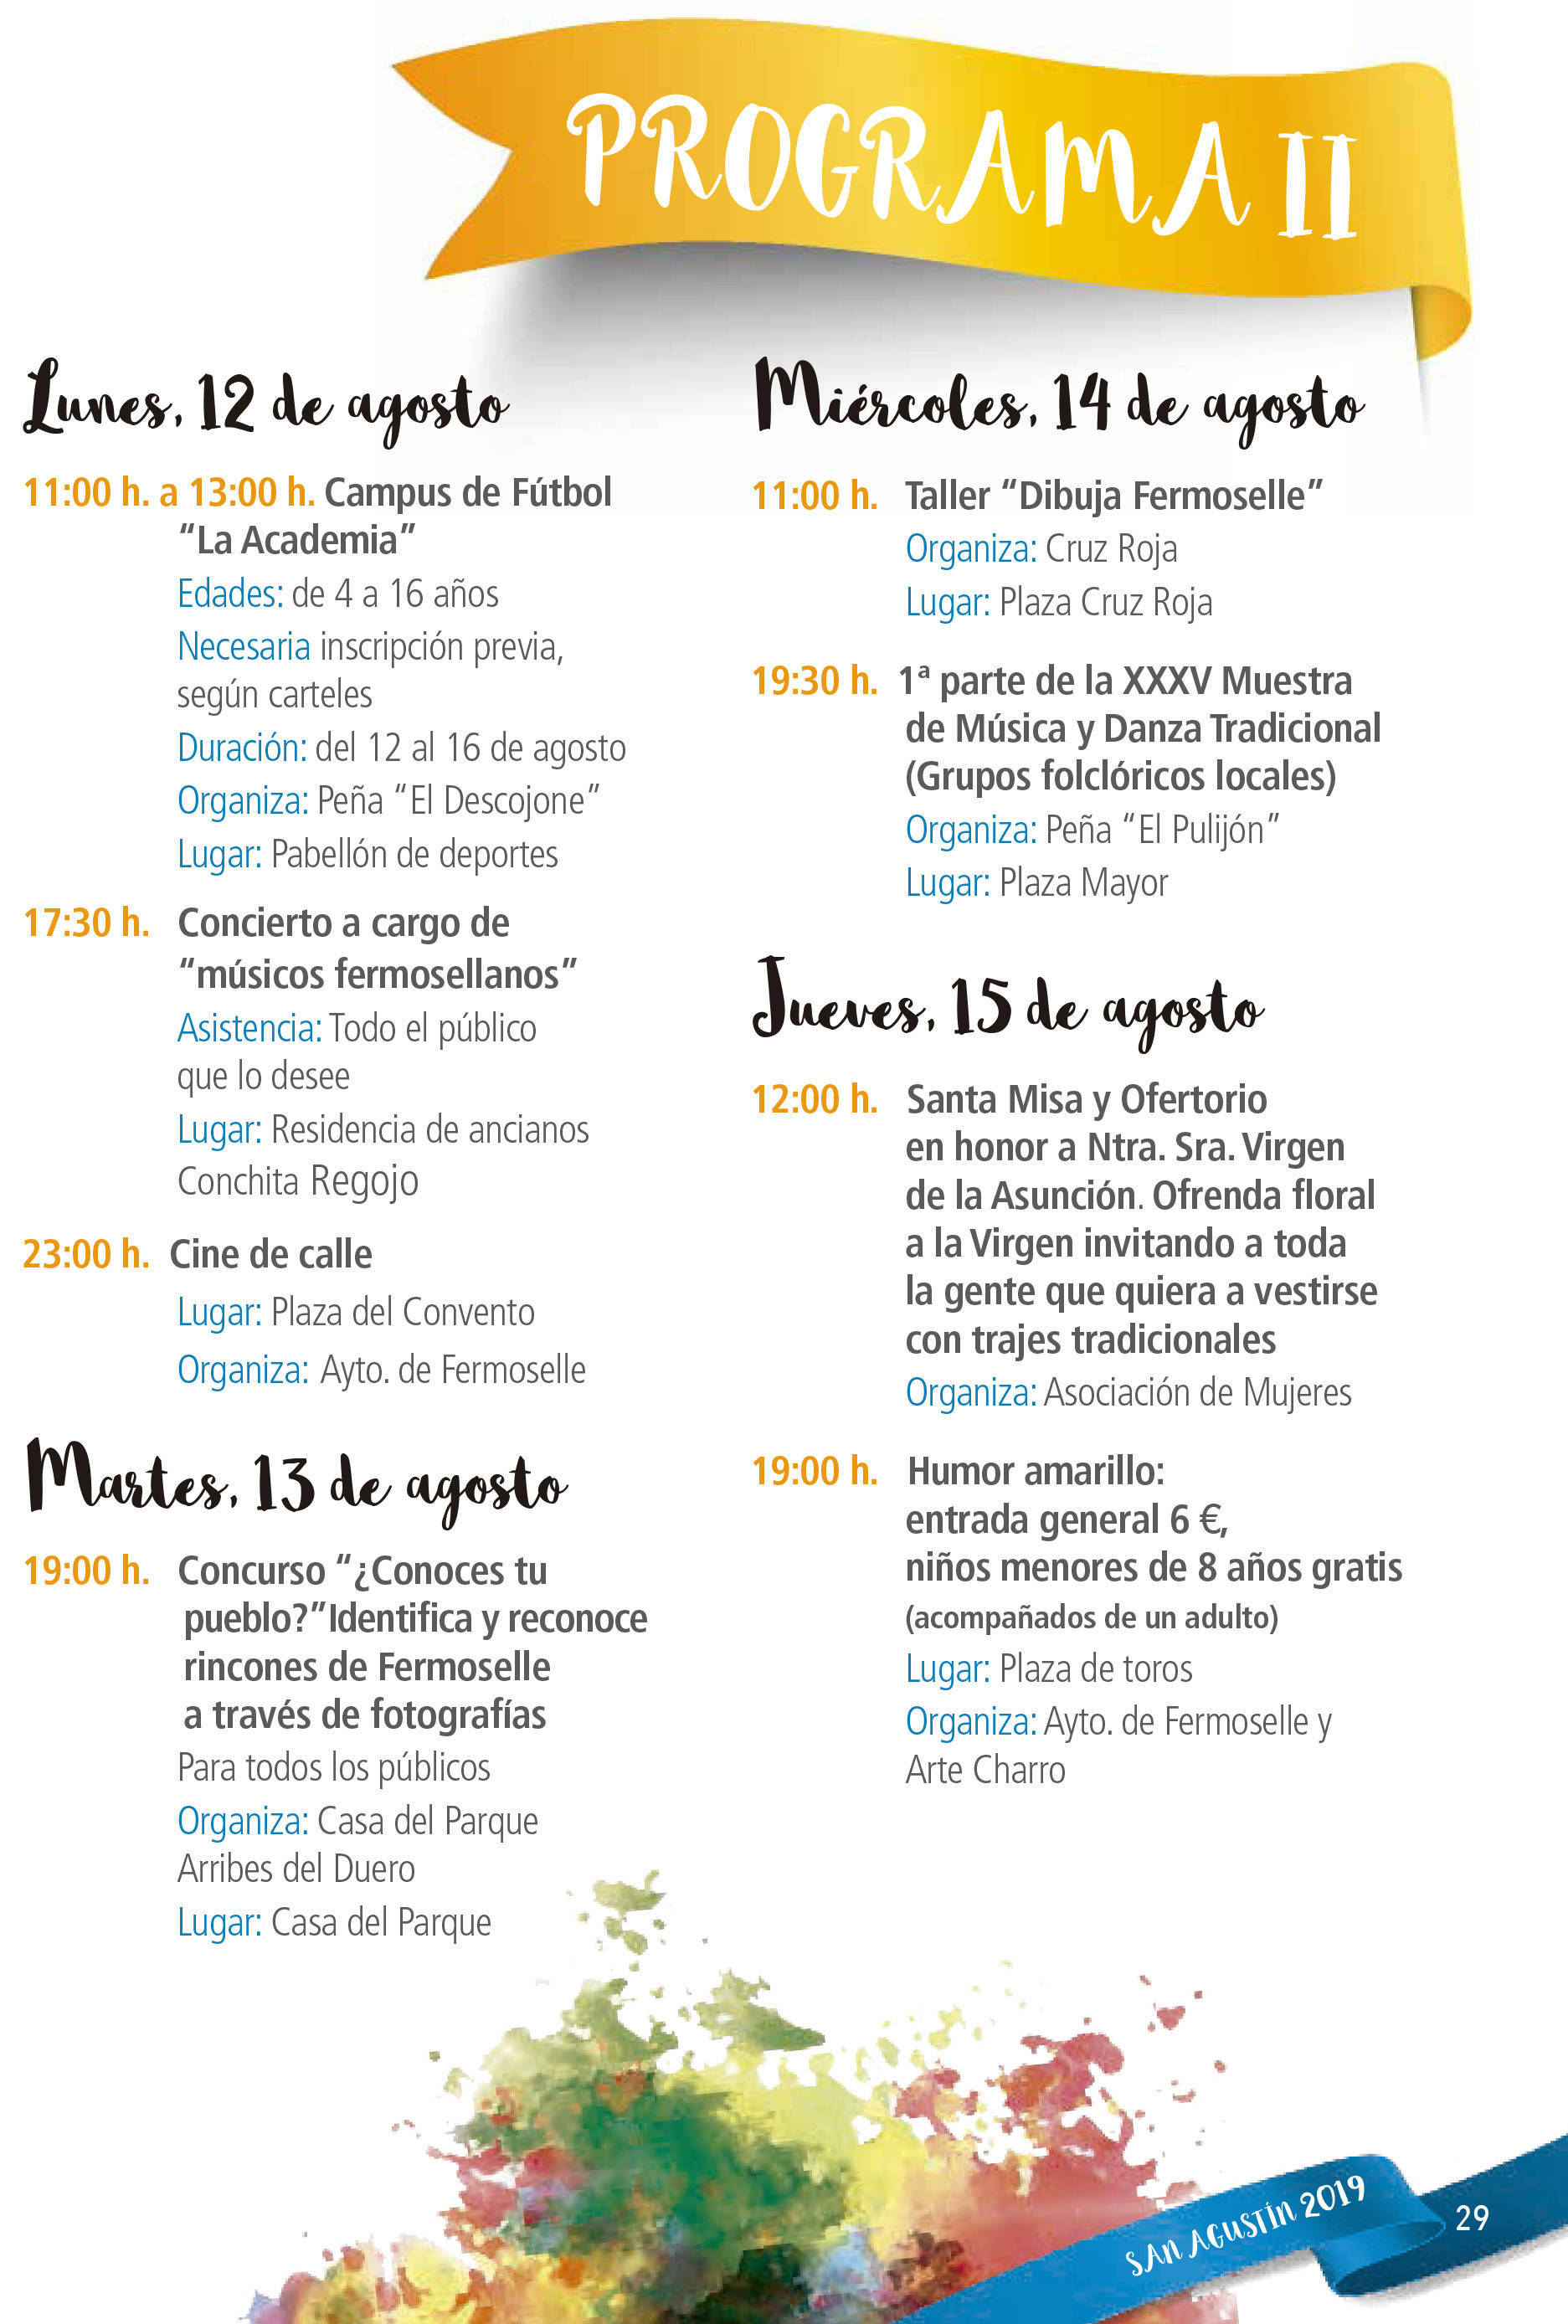 Programa de ferias y fiestas 2019 - Fermoselle (Zamora) 9